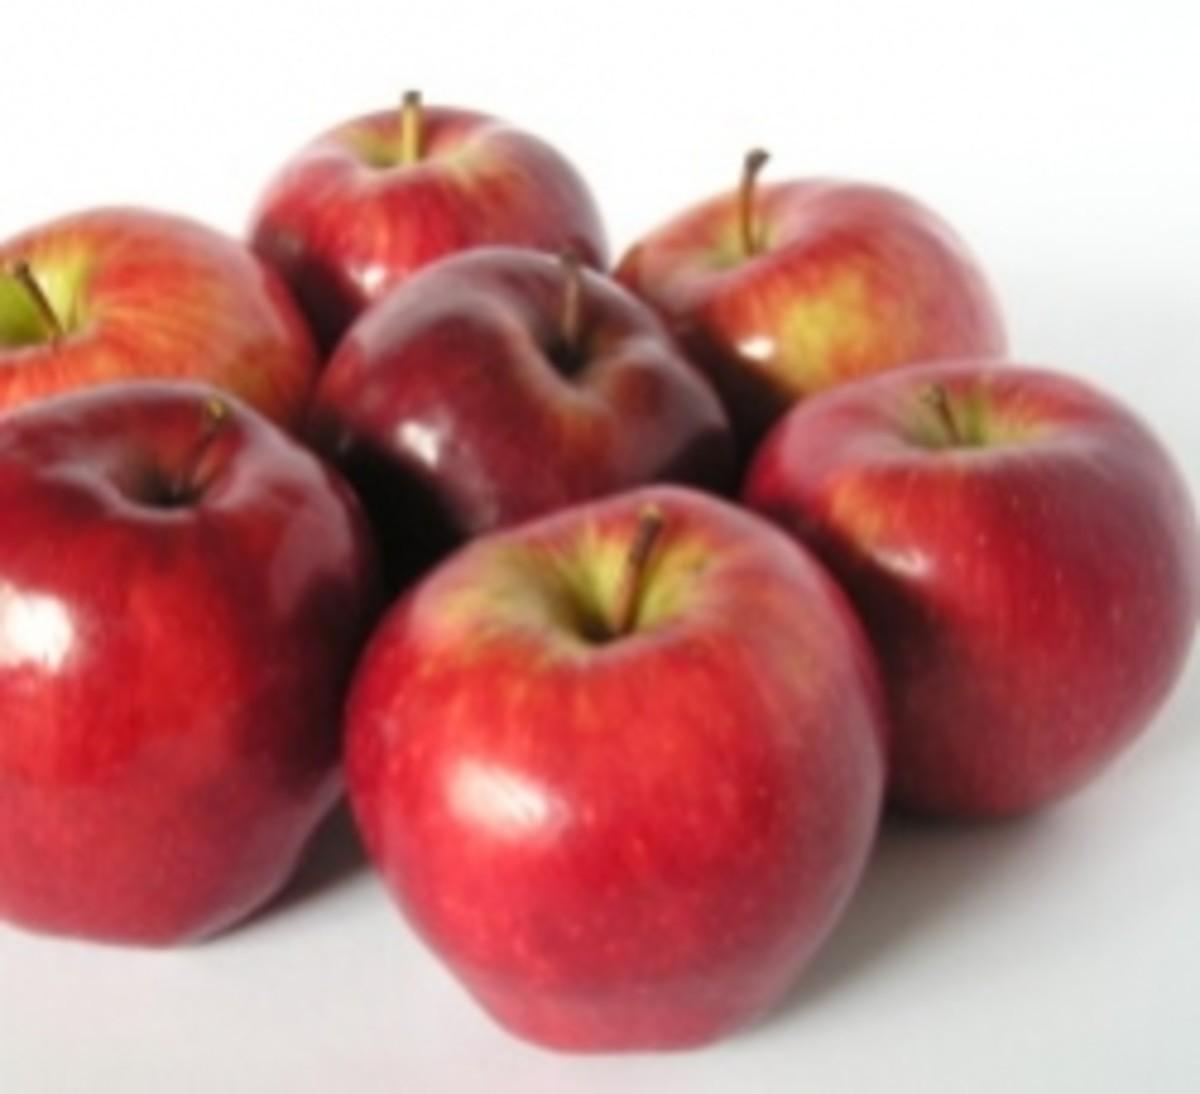 Apple Symbolism, Language and Myth